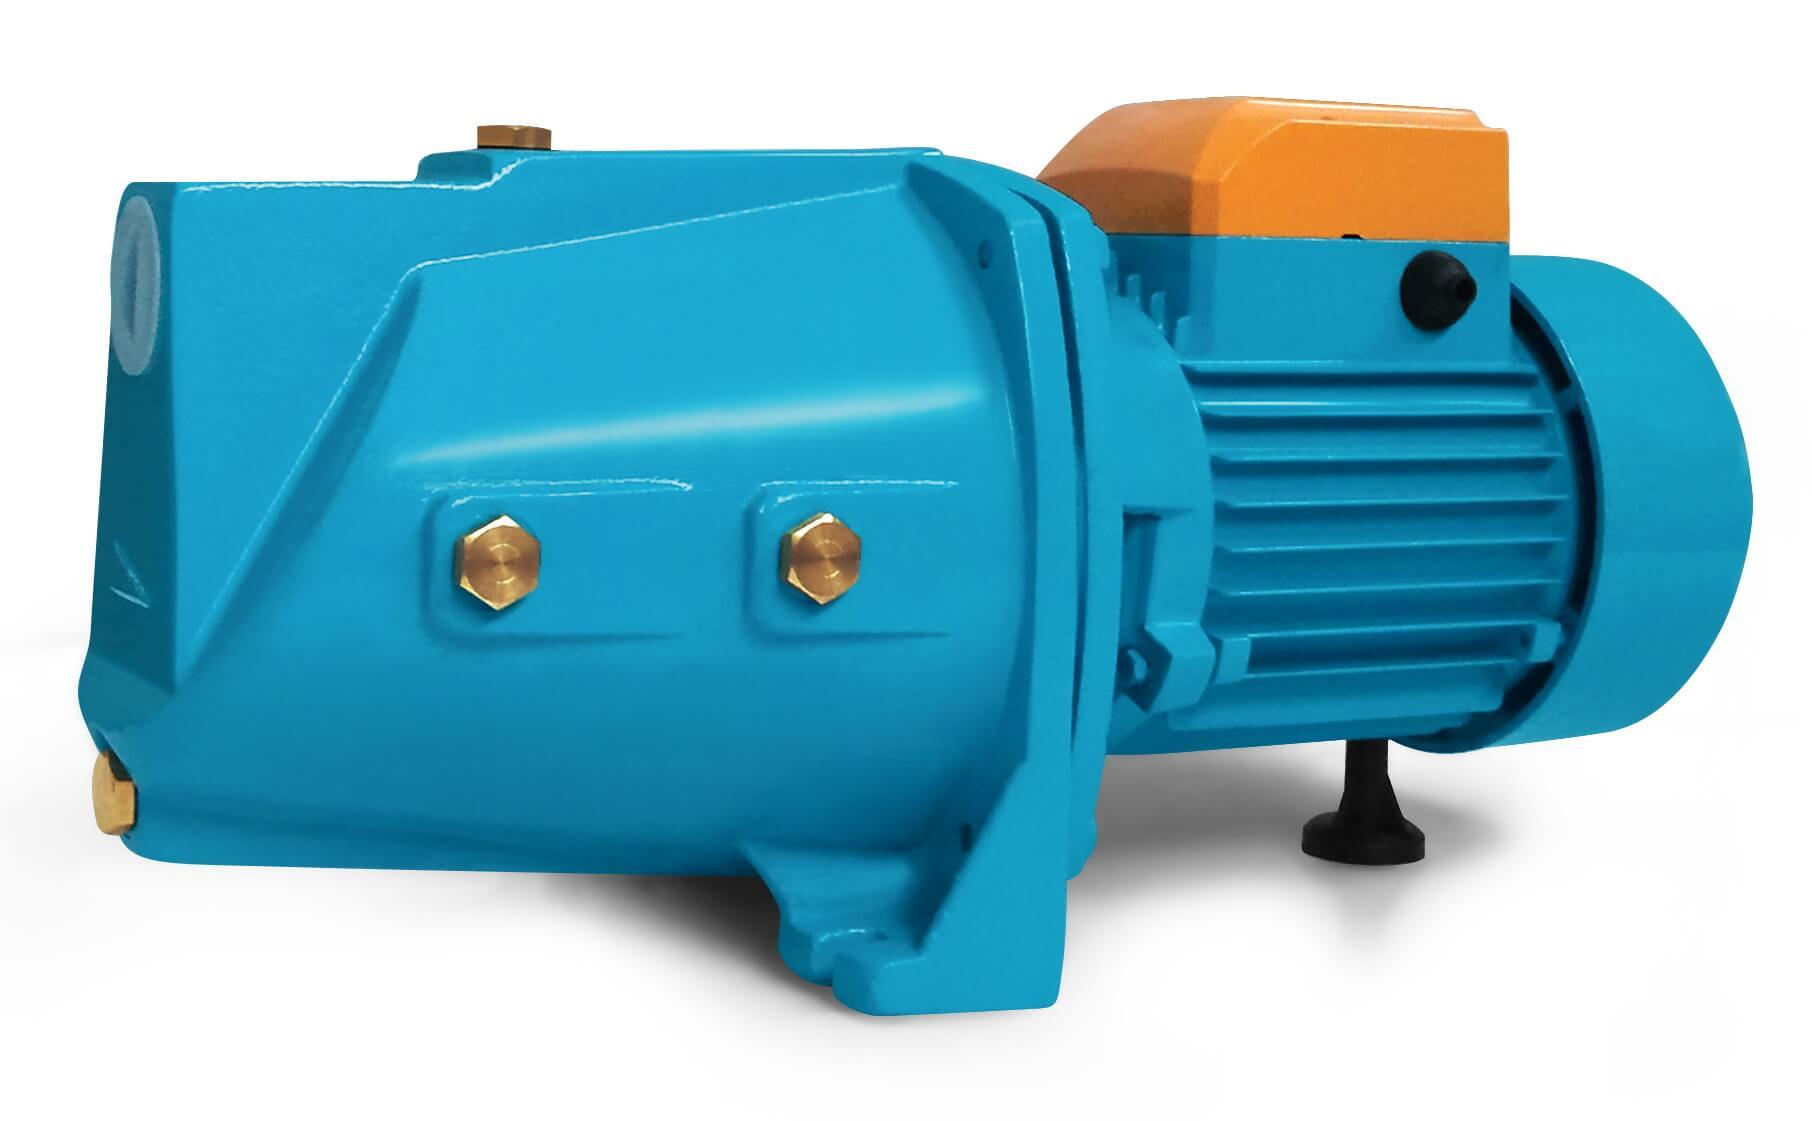 Eurom TP750S Professionele tuinpomp 750W | Centrifugaalpomp | Zelfaanzuigende grondwaterpomp